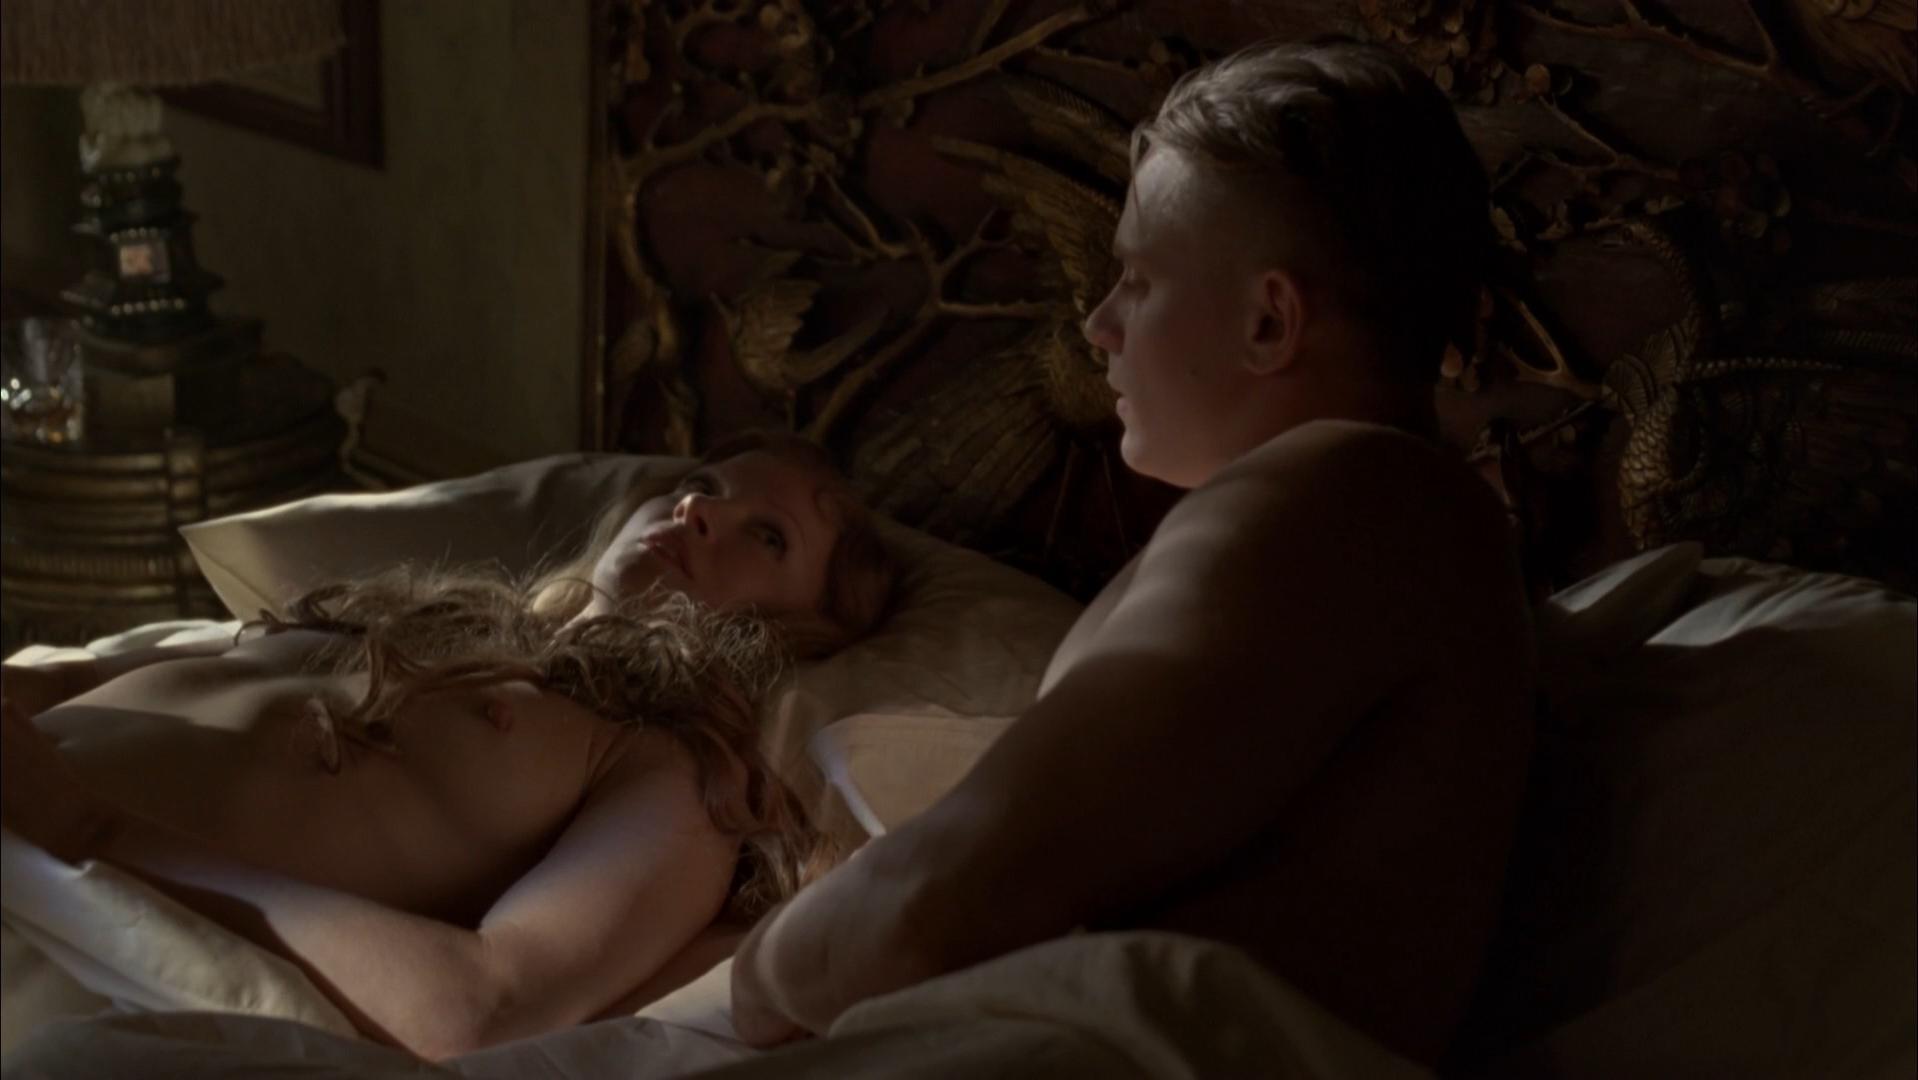 gretchen-mol-sexy-pics-nude-blowjob-raw-tube